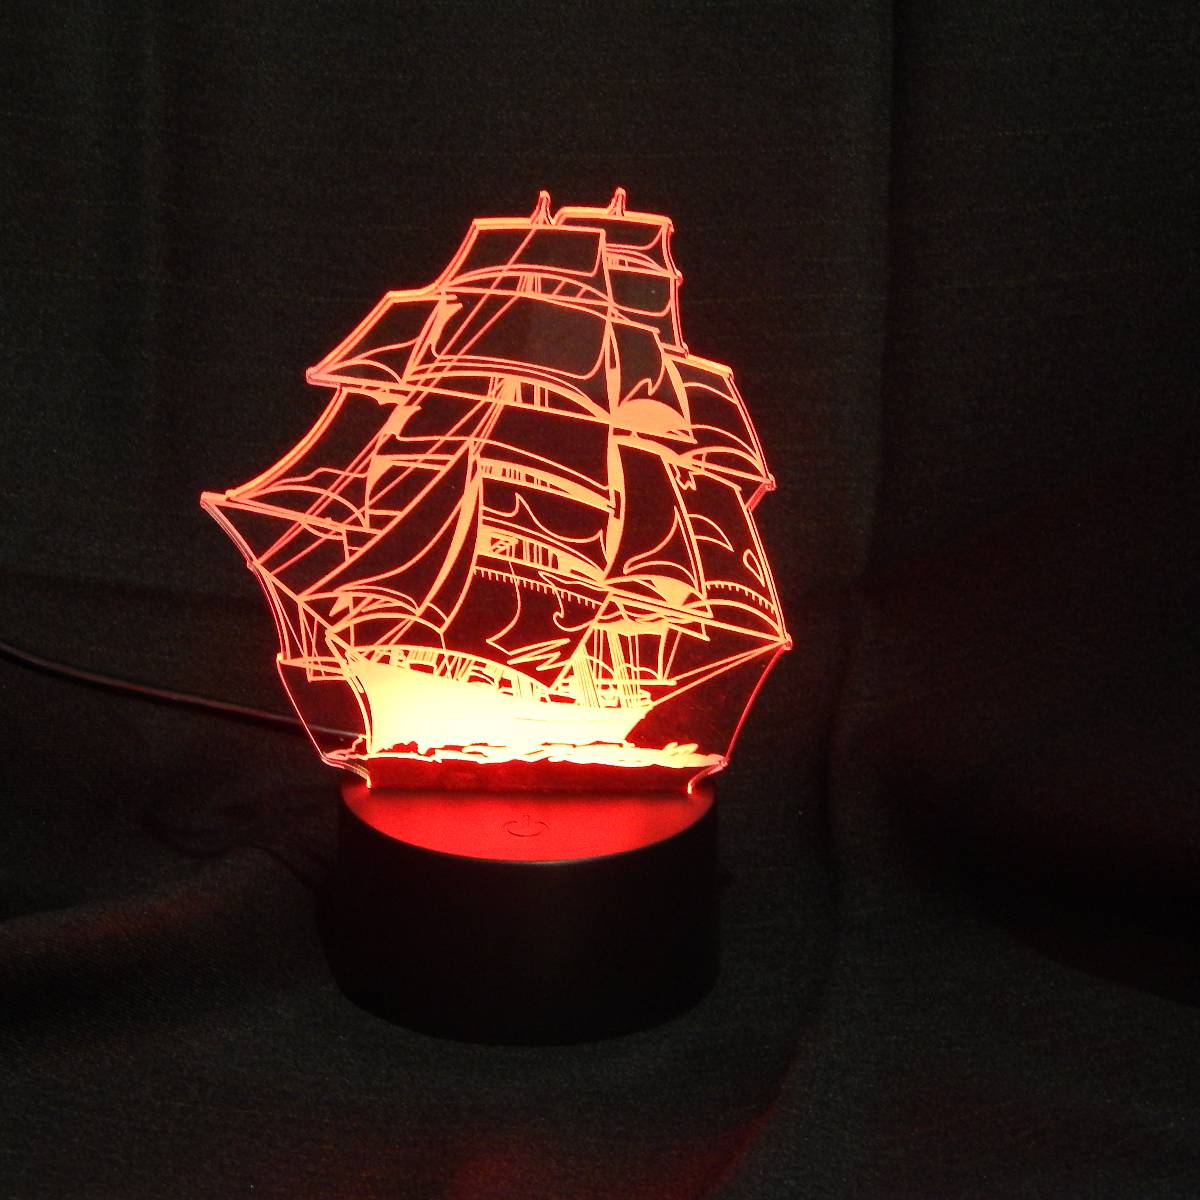 Lampu Meja Lampu Tidur Lampu Hias Kapal LED 3D Tradisional